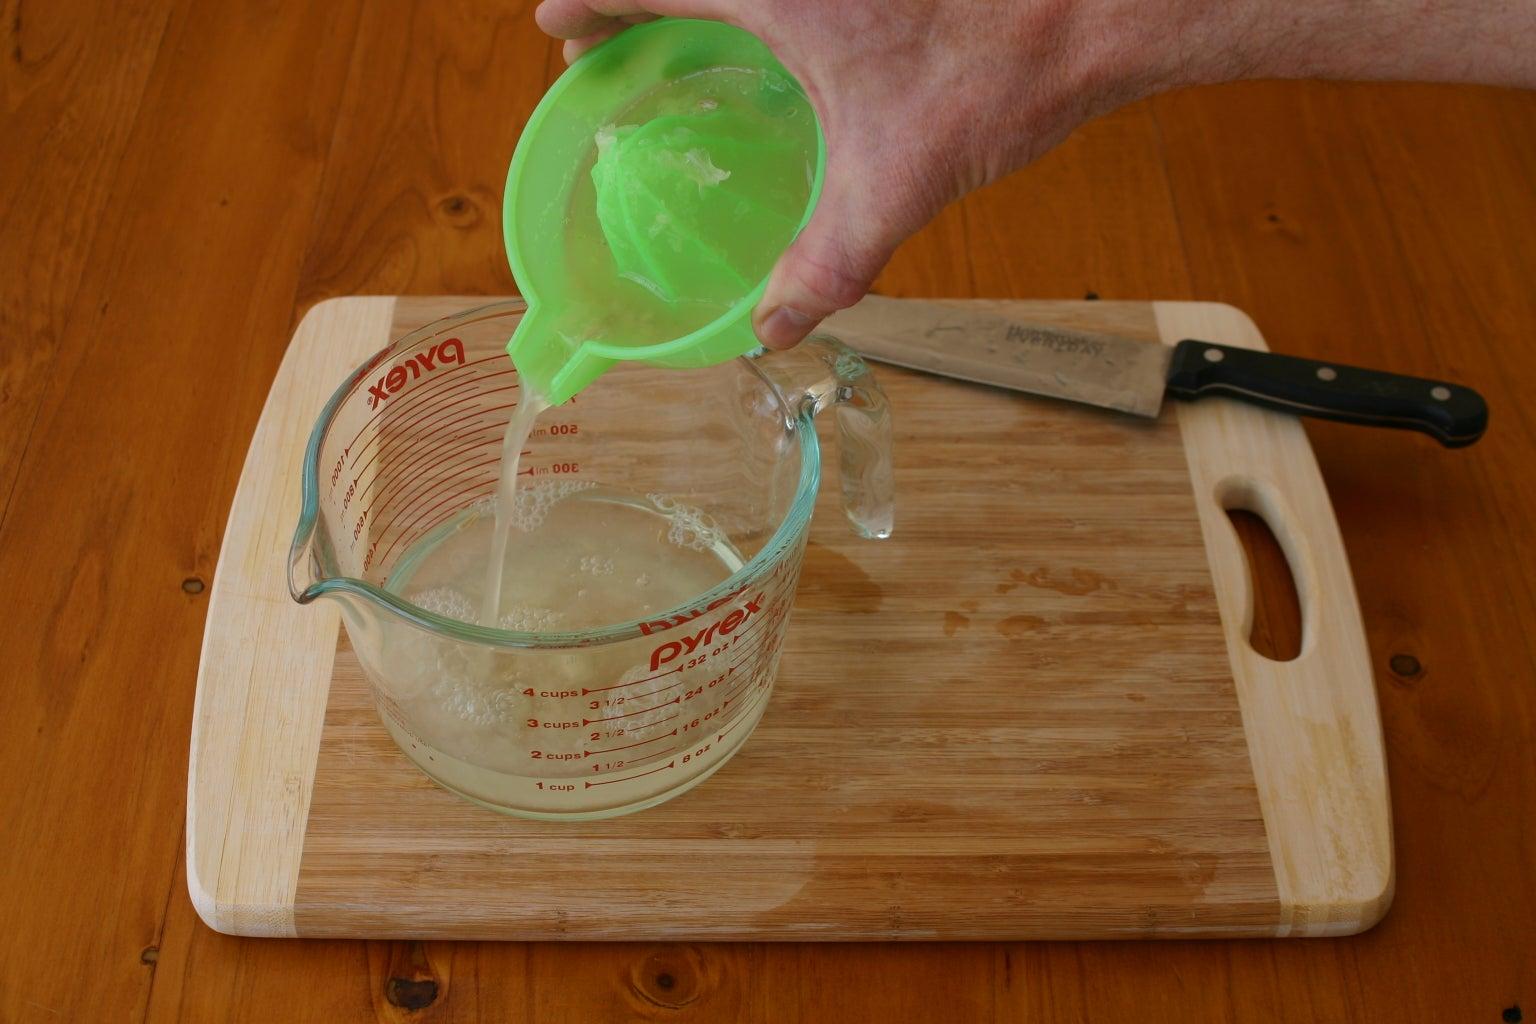 Pour the Lemon Juice Into the Microwave-safe Cup